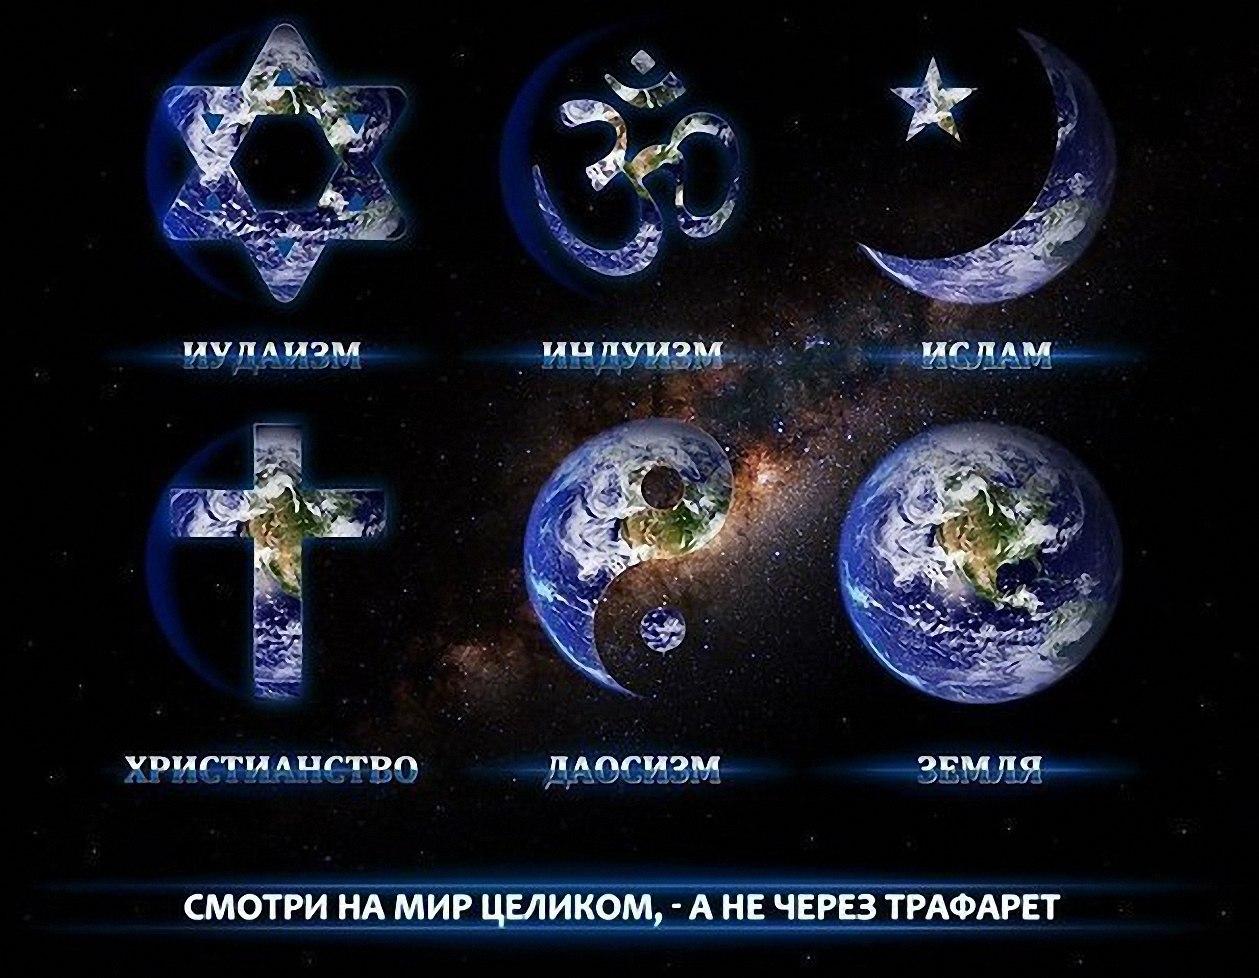 http://amalan.ru/wp-content/uploads/2014/11/http-cs402120.userapi.com-v402120061-54d8-cl9dbkMfQ78.jpg